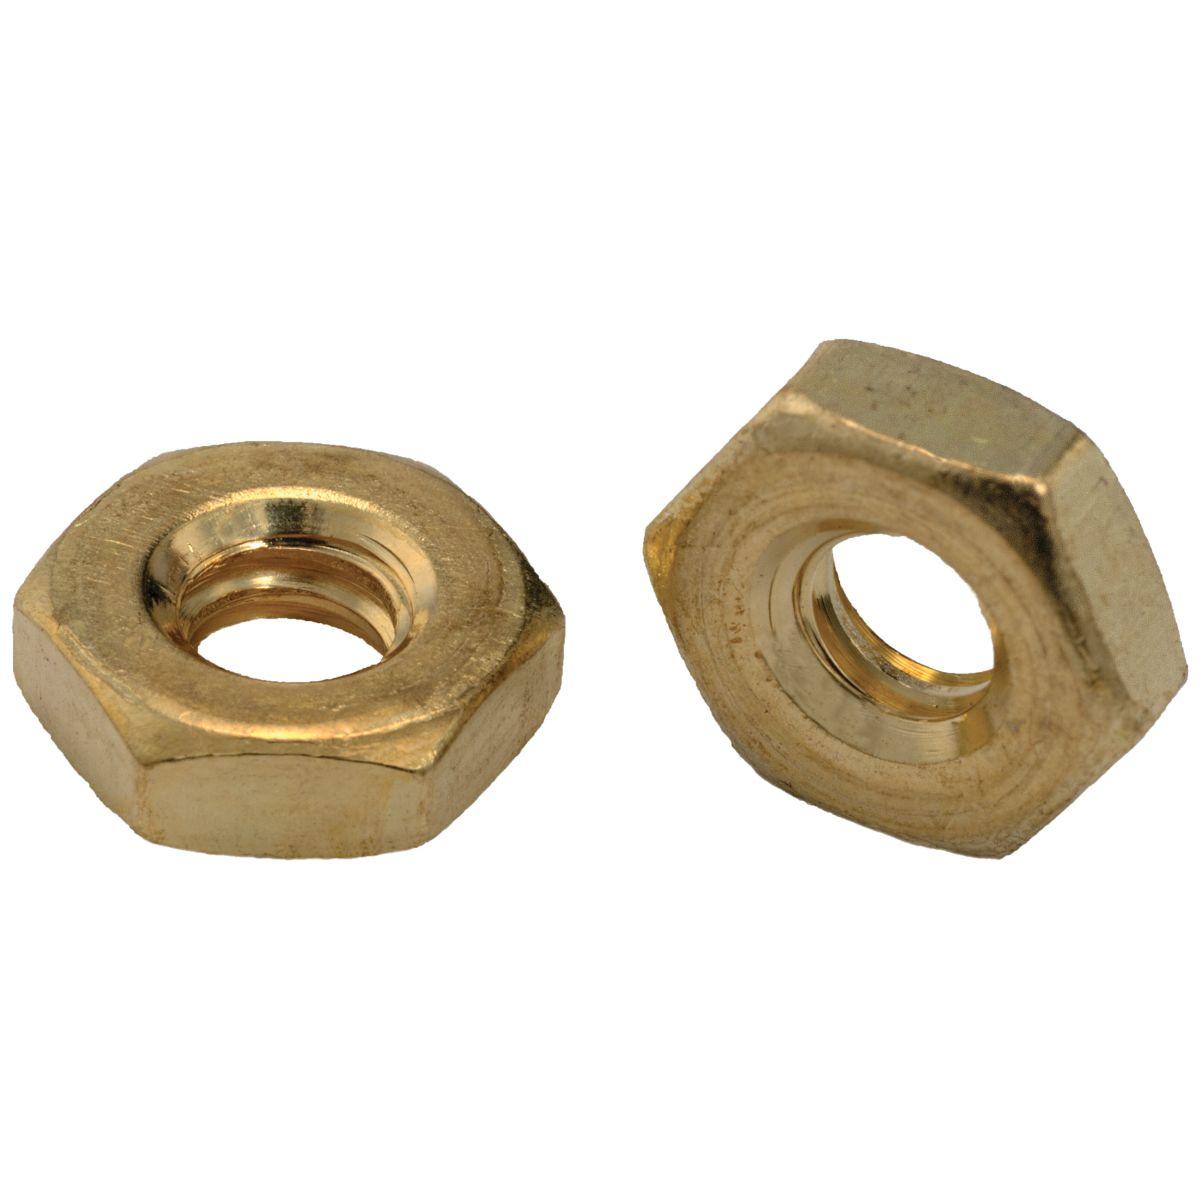 #12-24 Hex Machine Screw Nuts — Brass, Coarse, 100/PKG